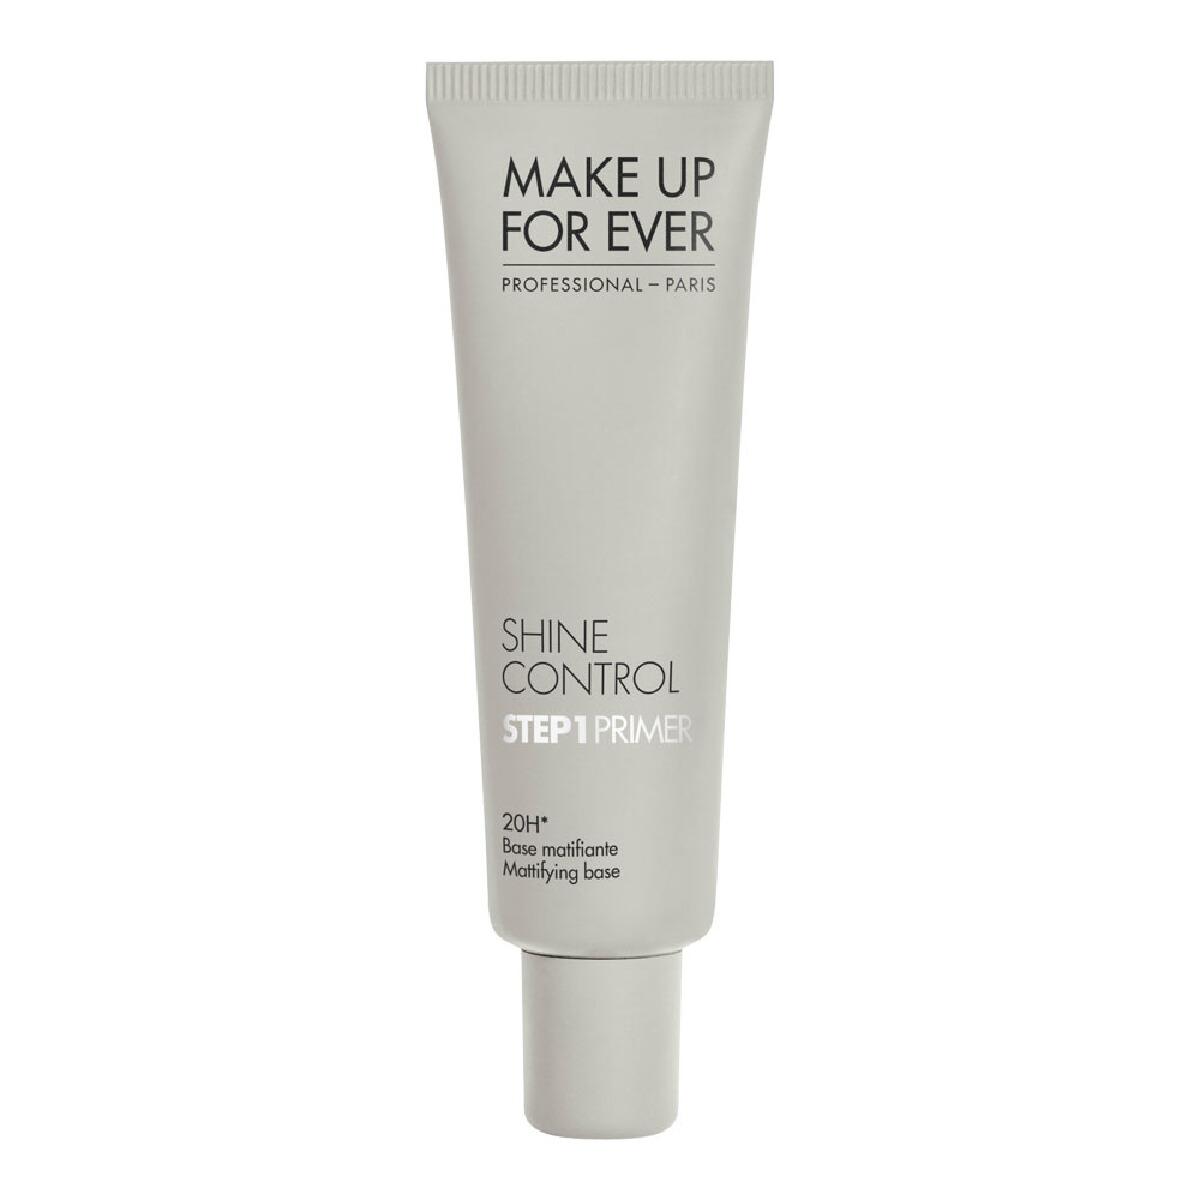 Make Up For Ever Shine Control Step 1 Primer